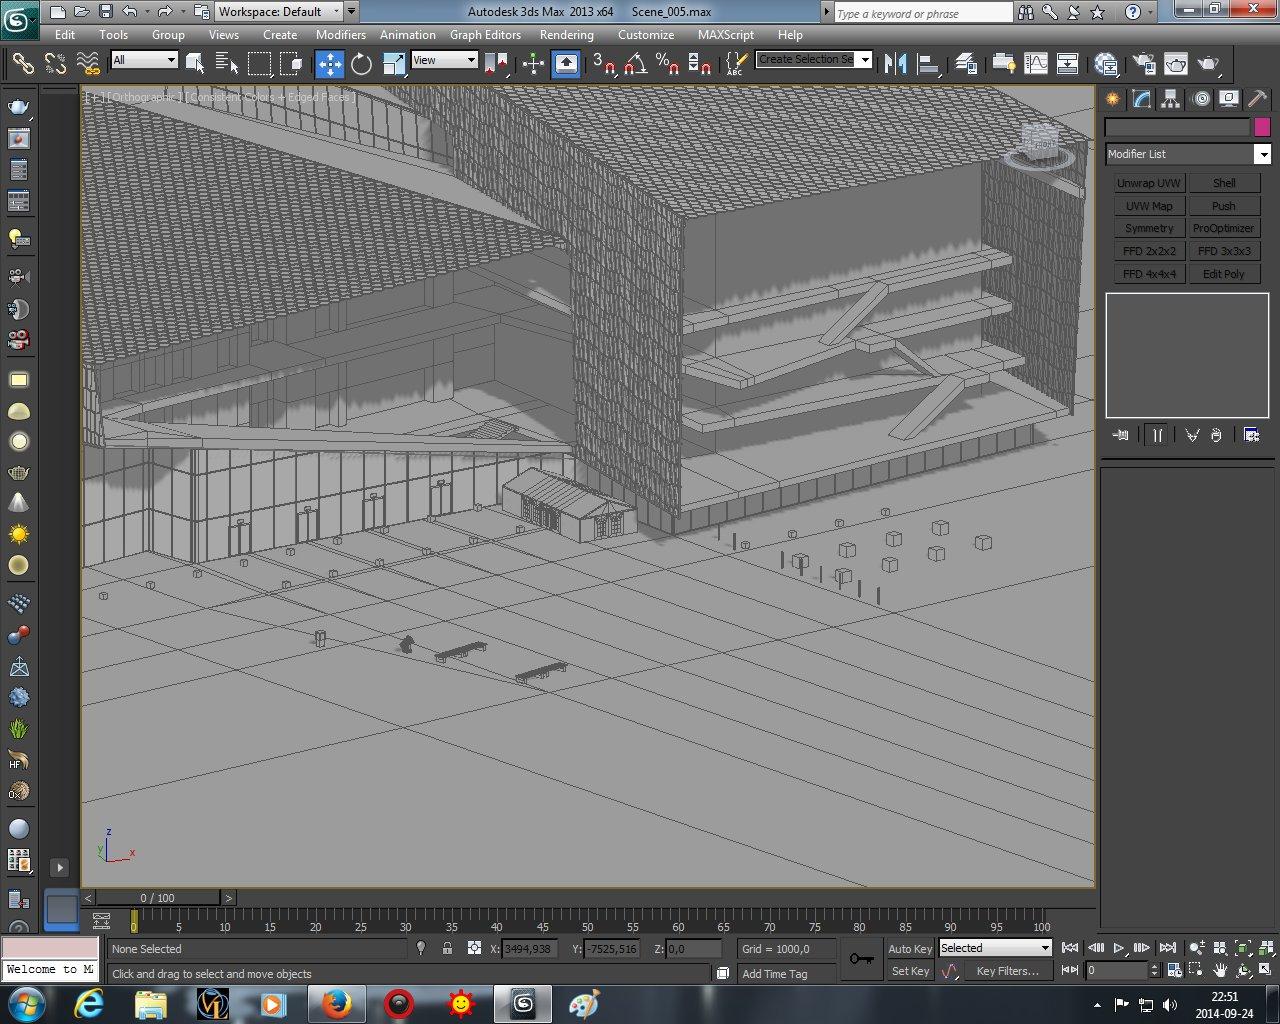 26_building_and_env_no_front_nr_2676.jpg